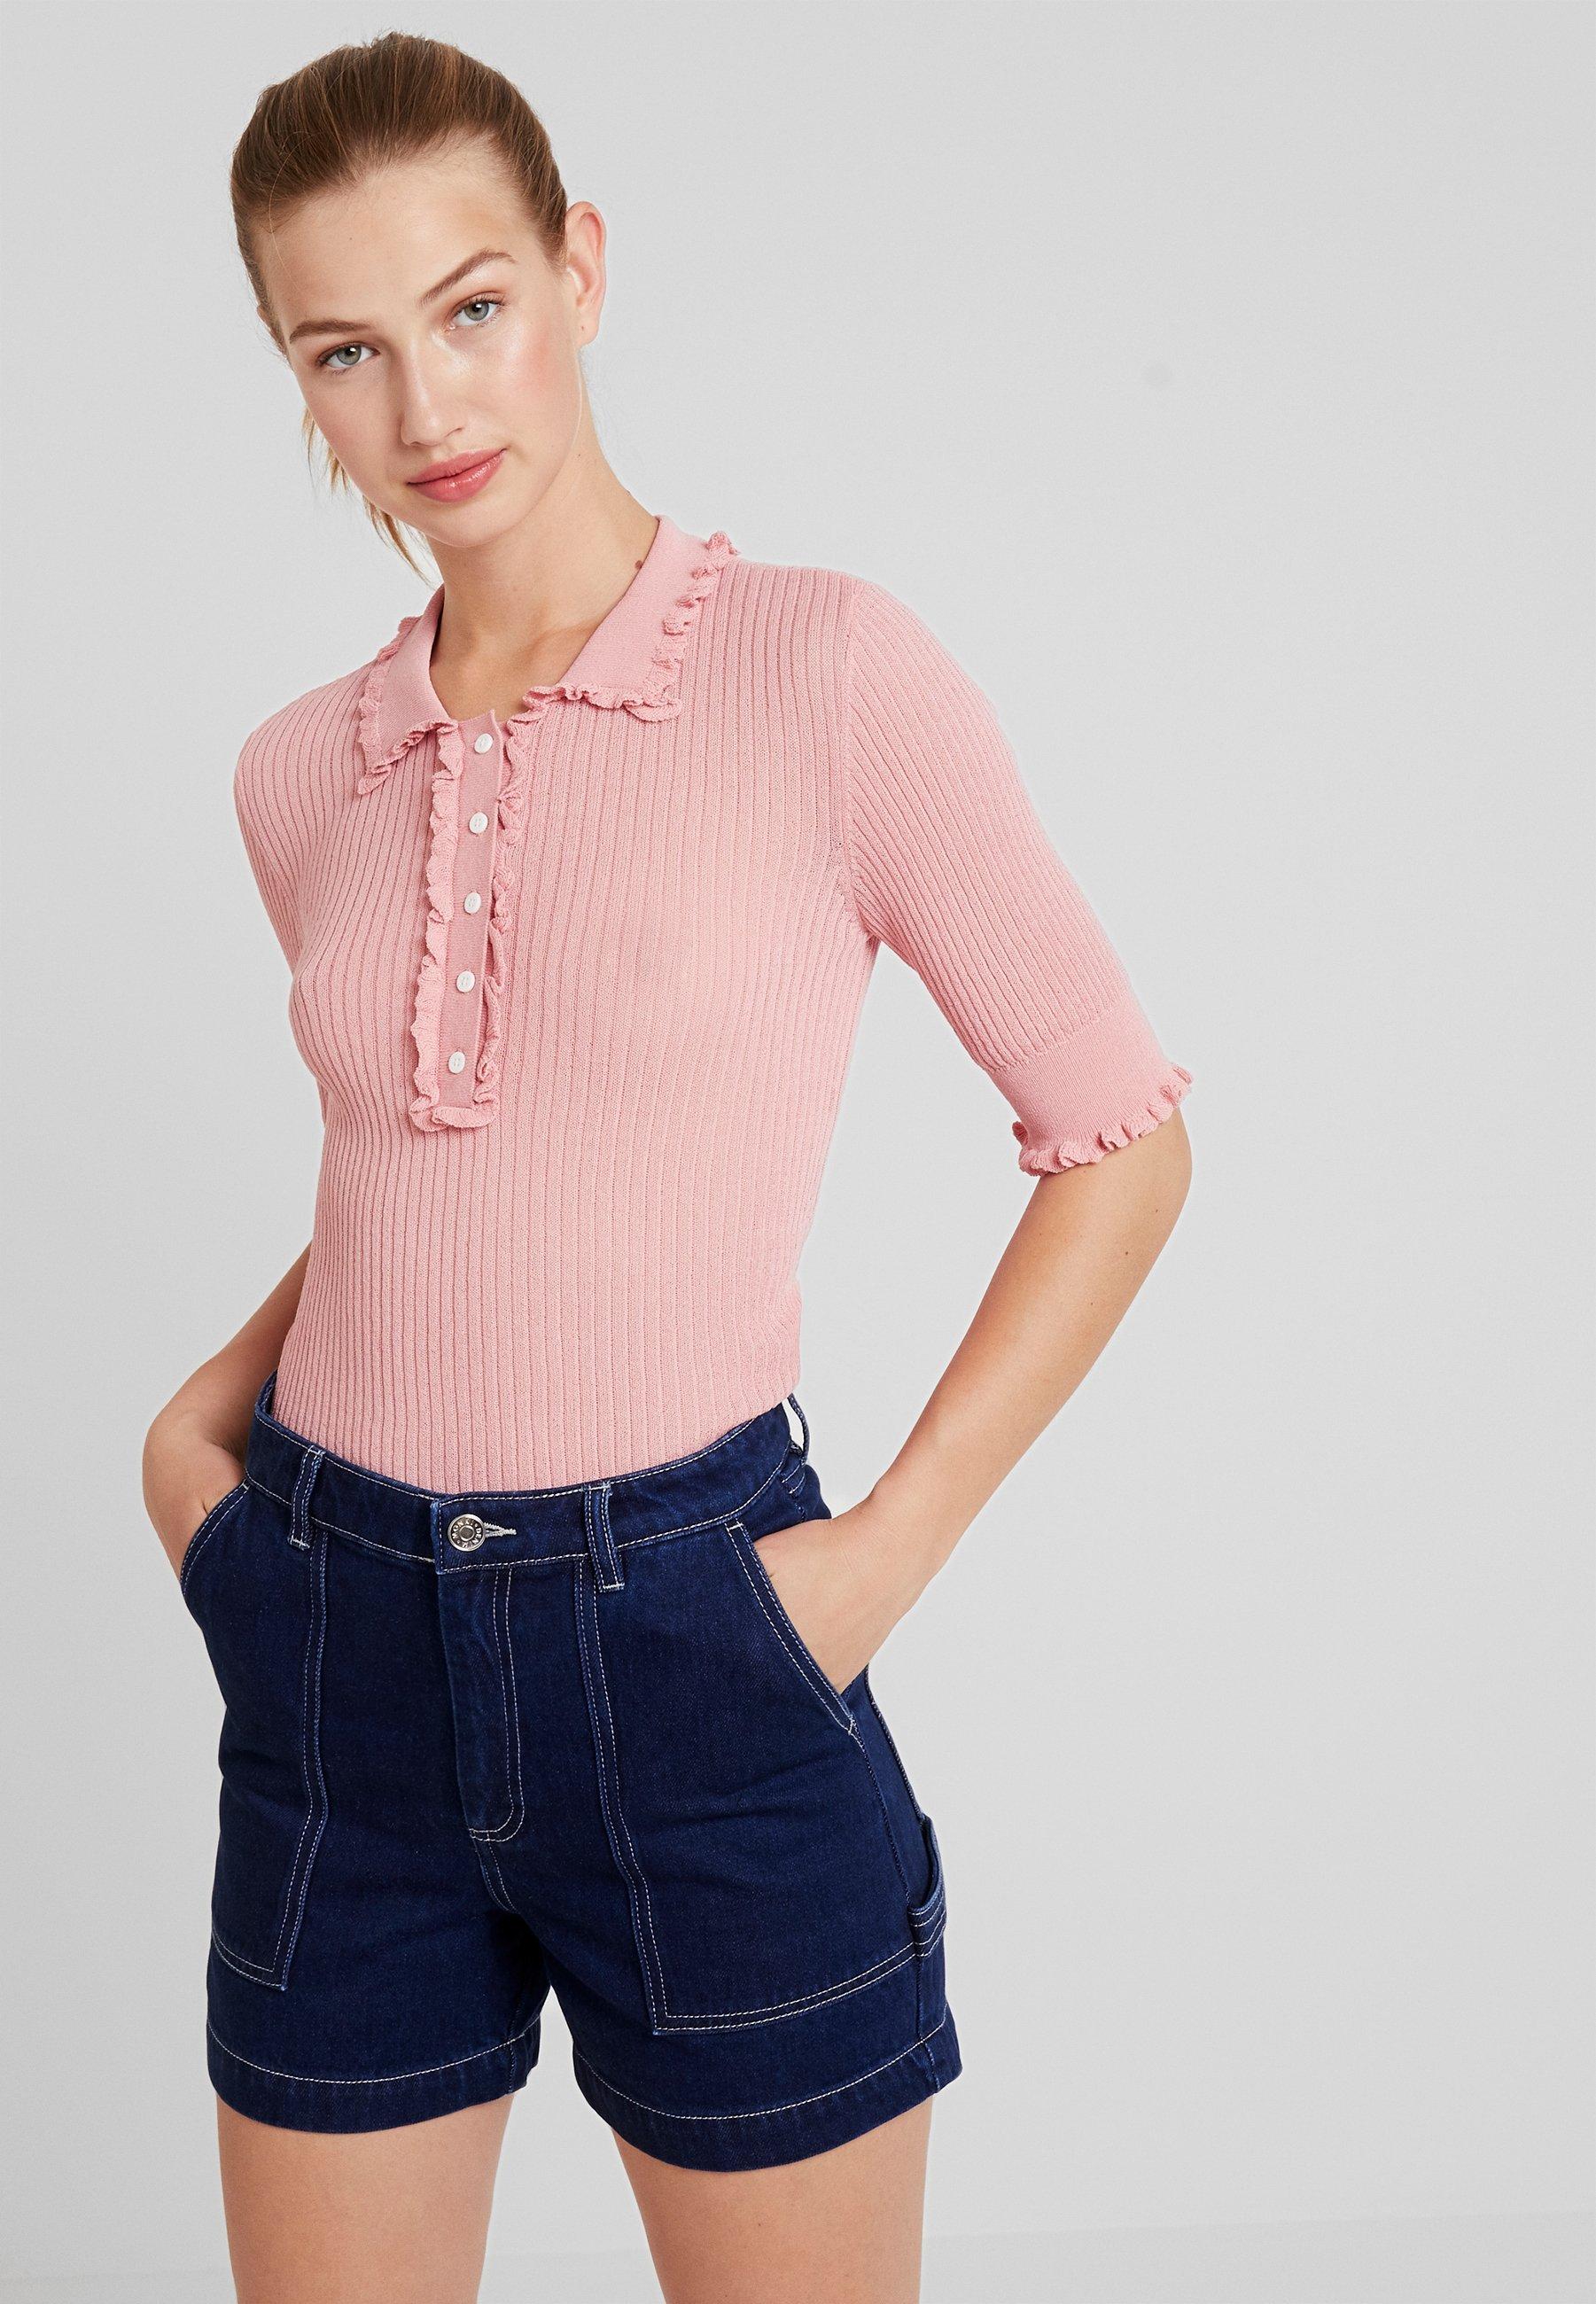 Imprimé Yas YaseliseT shirt Quartz Pink Ljc5Aq34RS